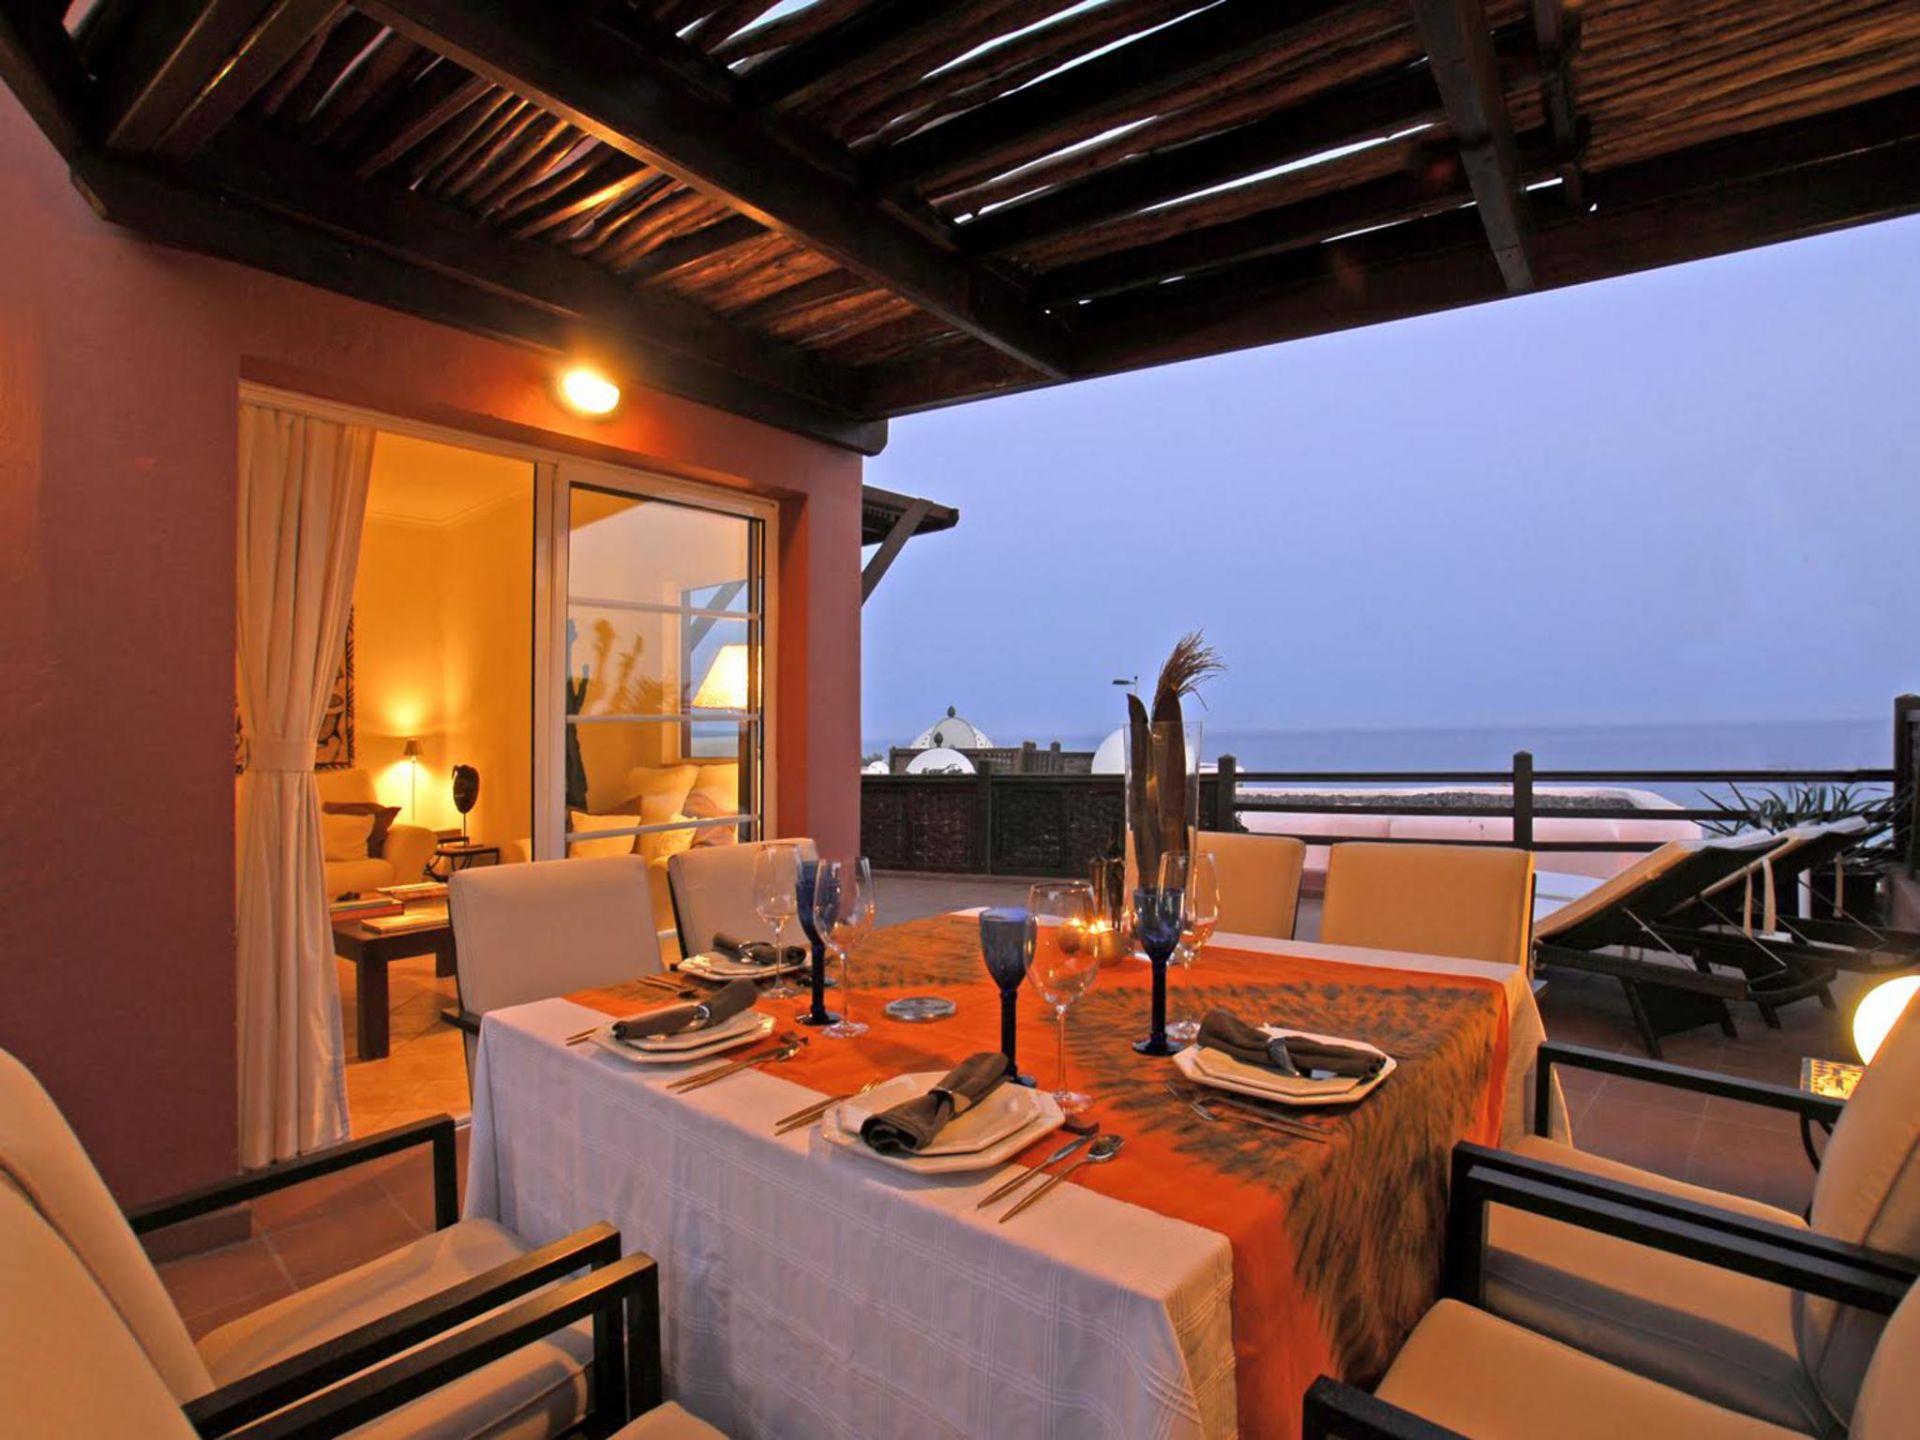 Holiday apartment Villa San Agustin 10 - Holiday Rental (854295), Maspalomas, Gran Canaria, Canary Islands, Spain, picture 33